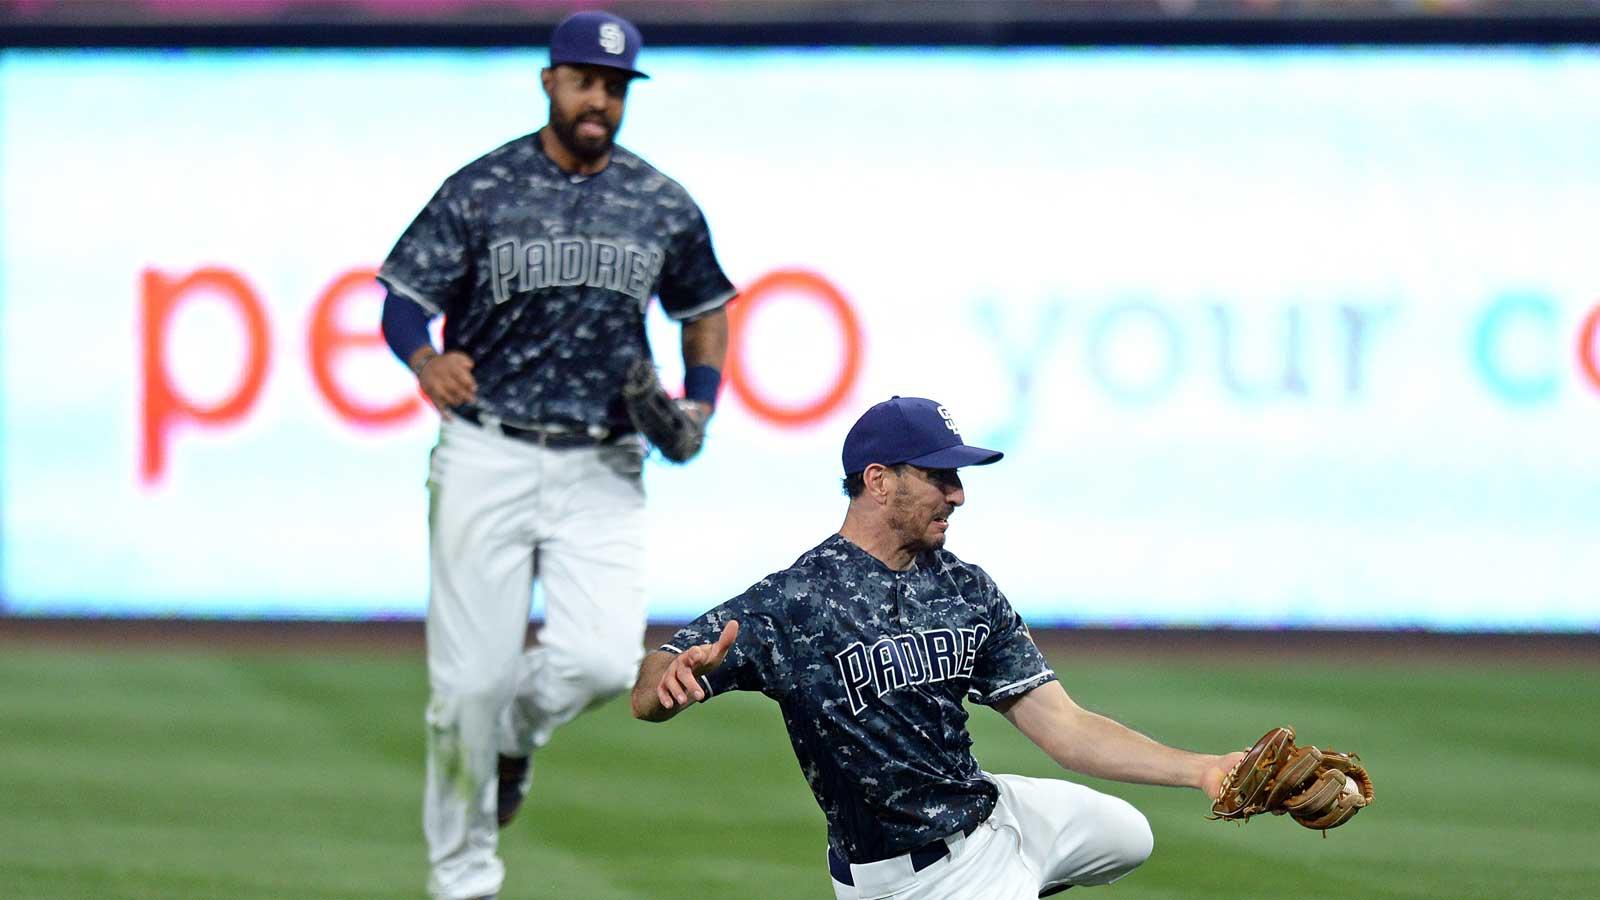 Rookie Perdomo takes loss as Padres fall to Rockies, 10-3